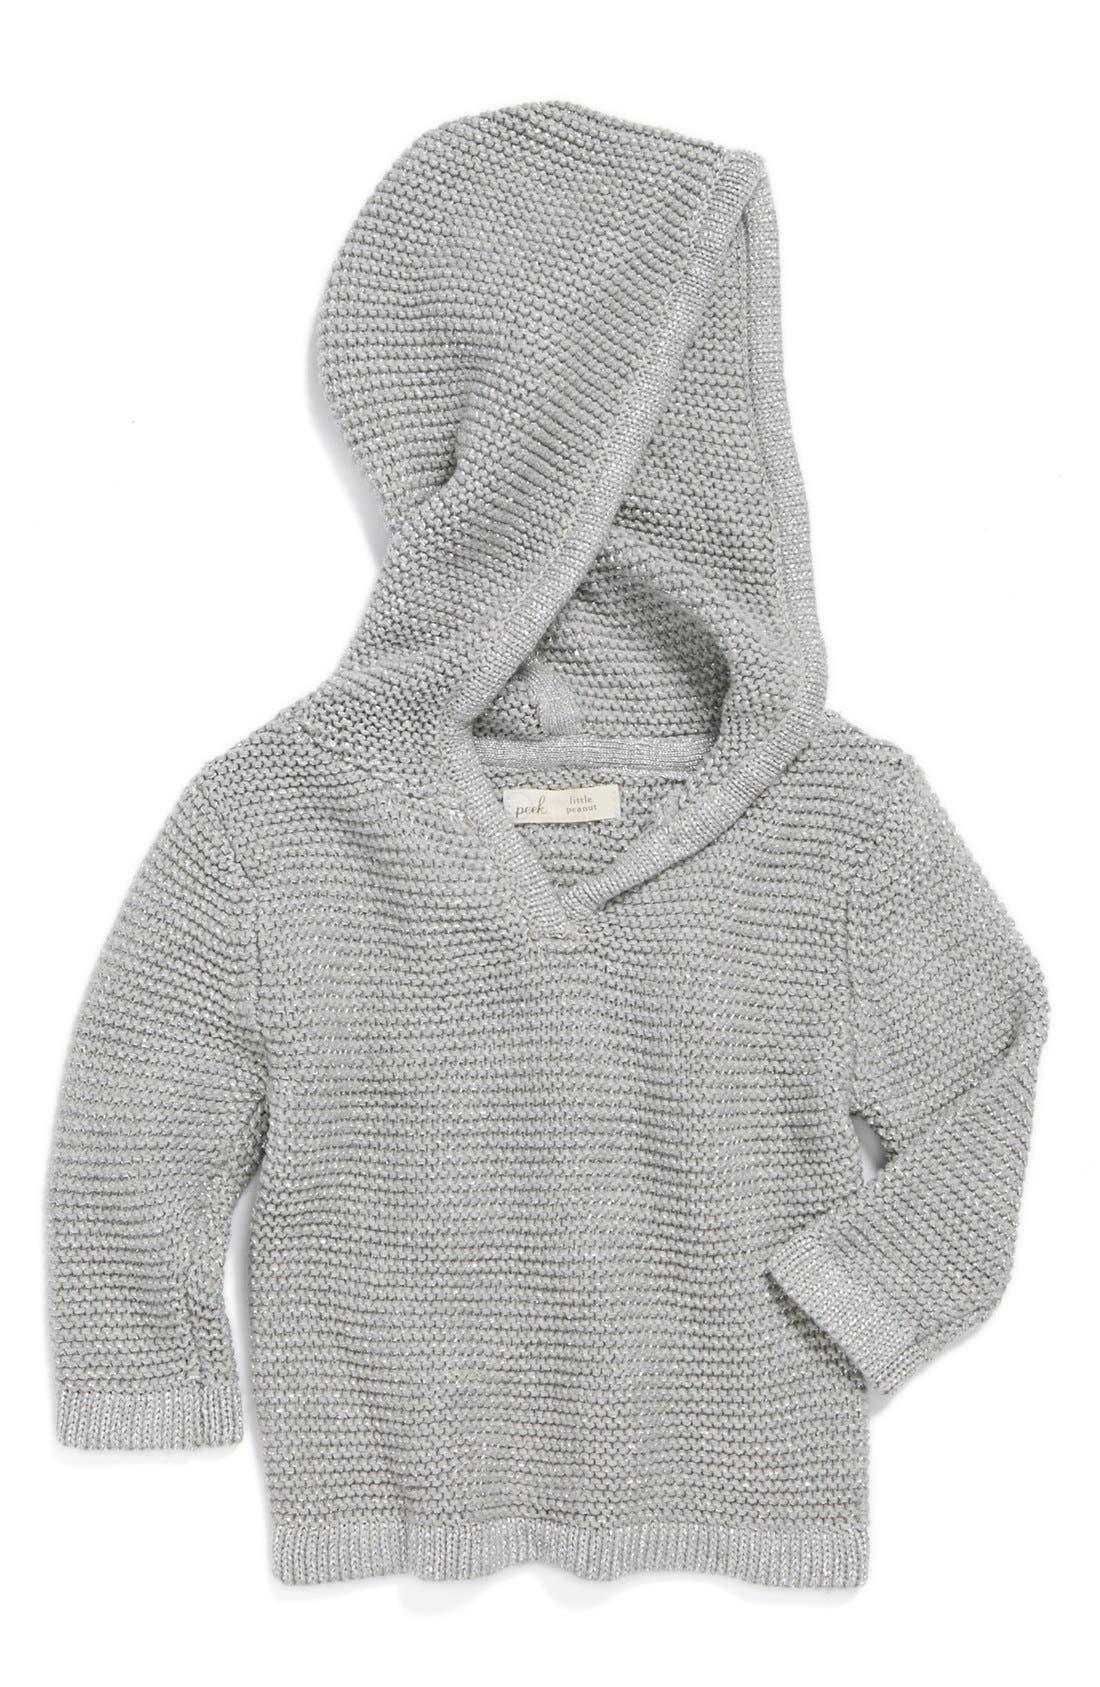 Main Image - Peek 'Beca' Hooded Sweater (Baby)